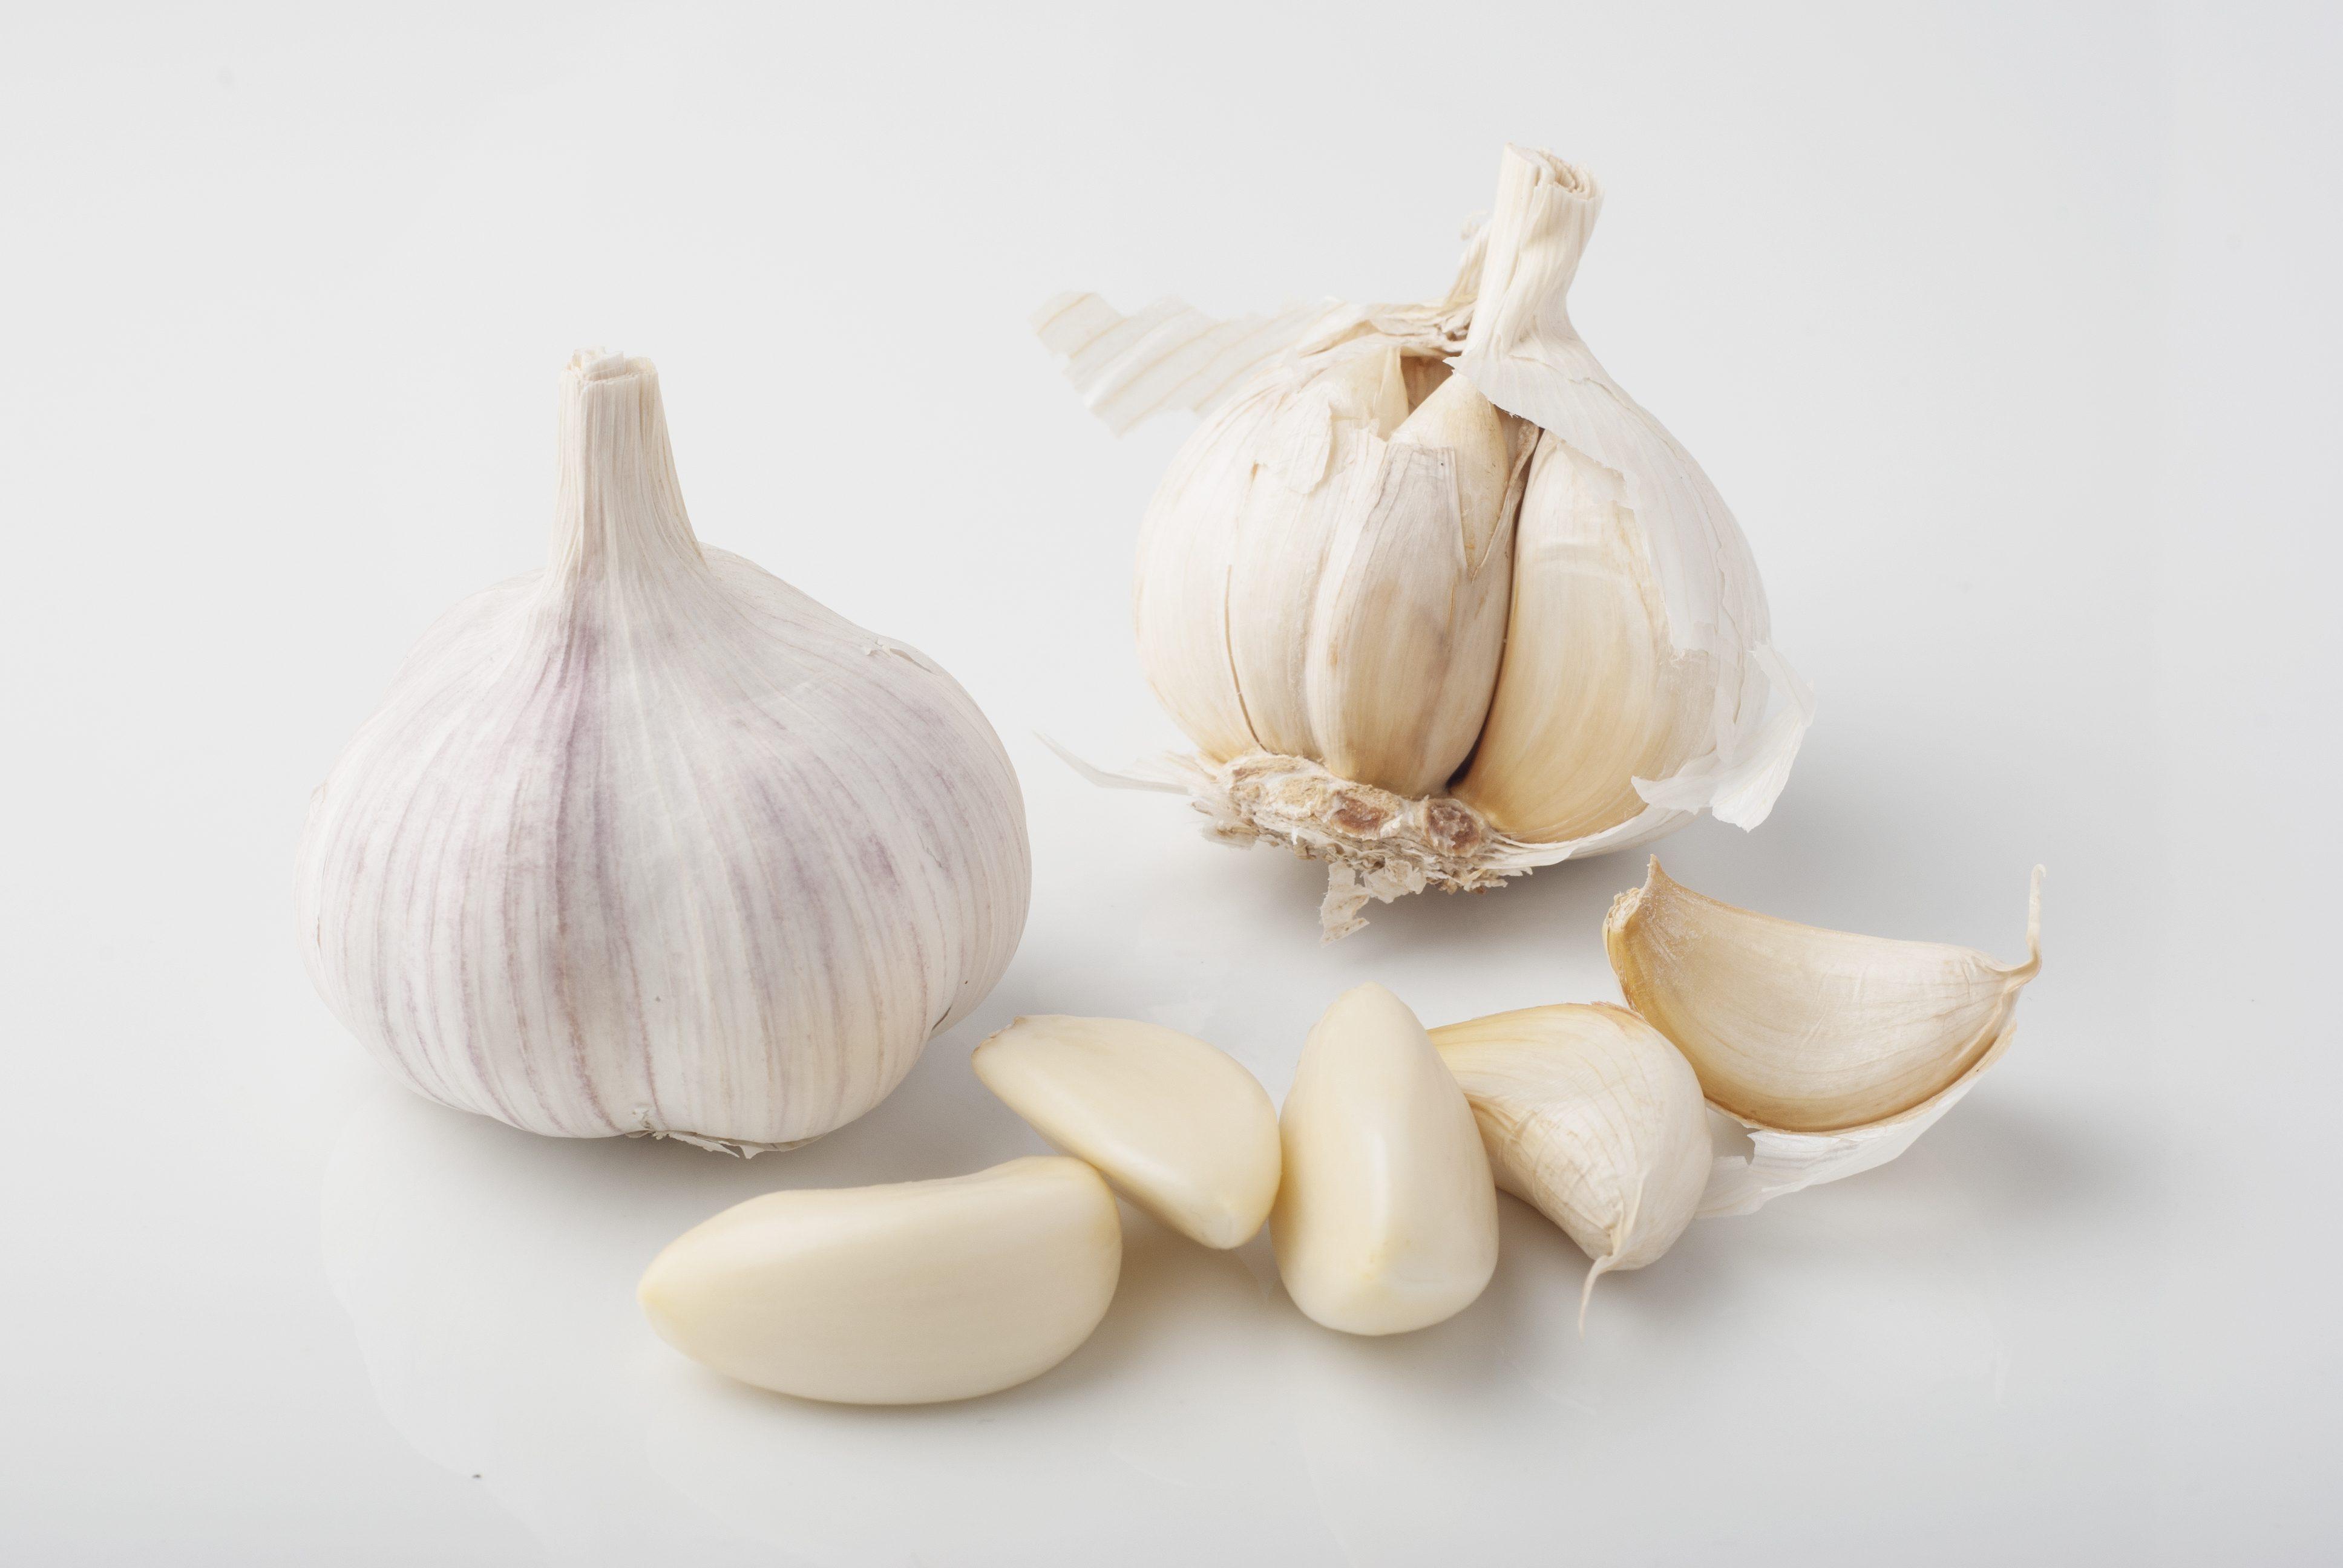 Close-Up Of Garlic On White Background